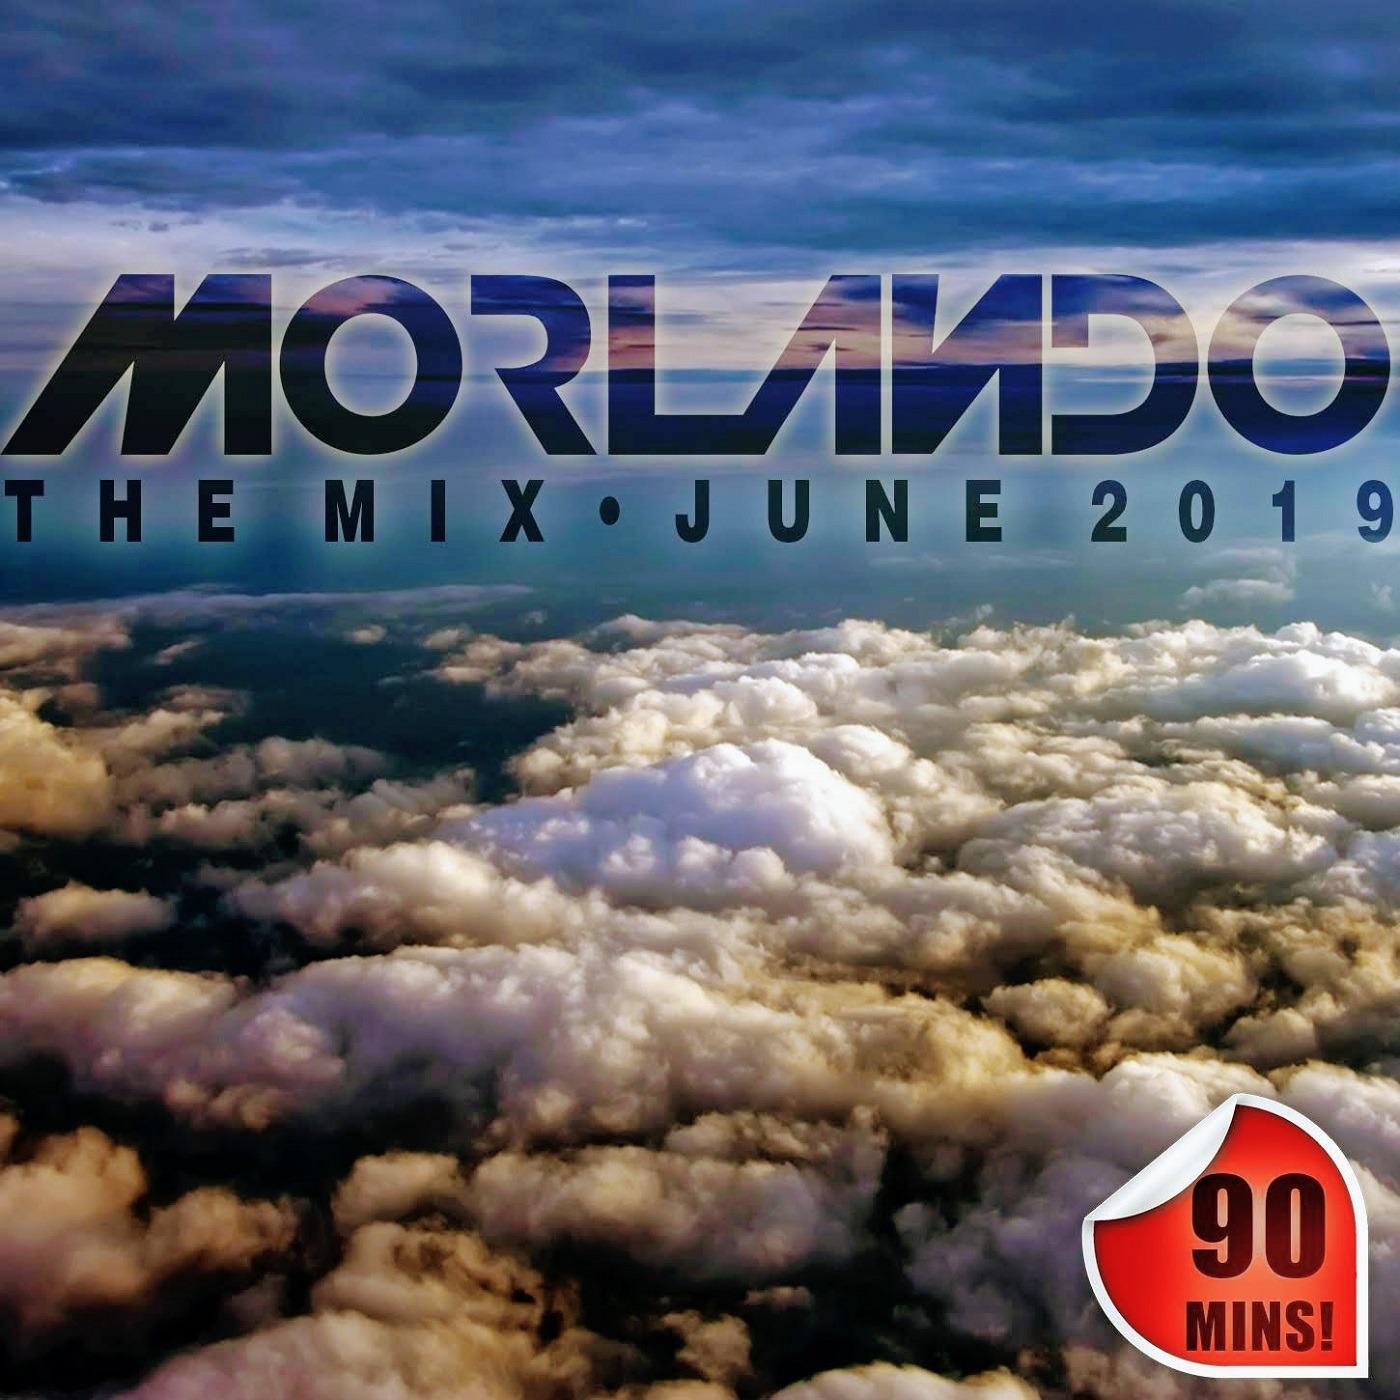 Morlando - The Mix - June 2019 Morlando - The Mix podcast